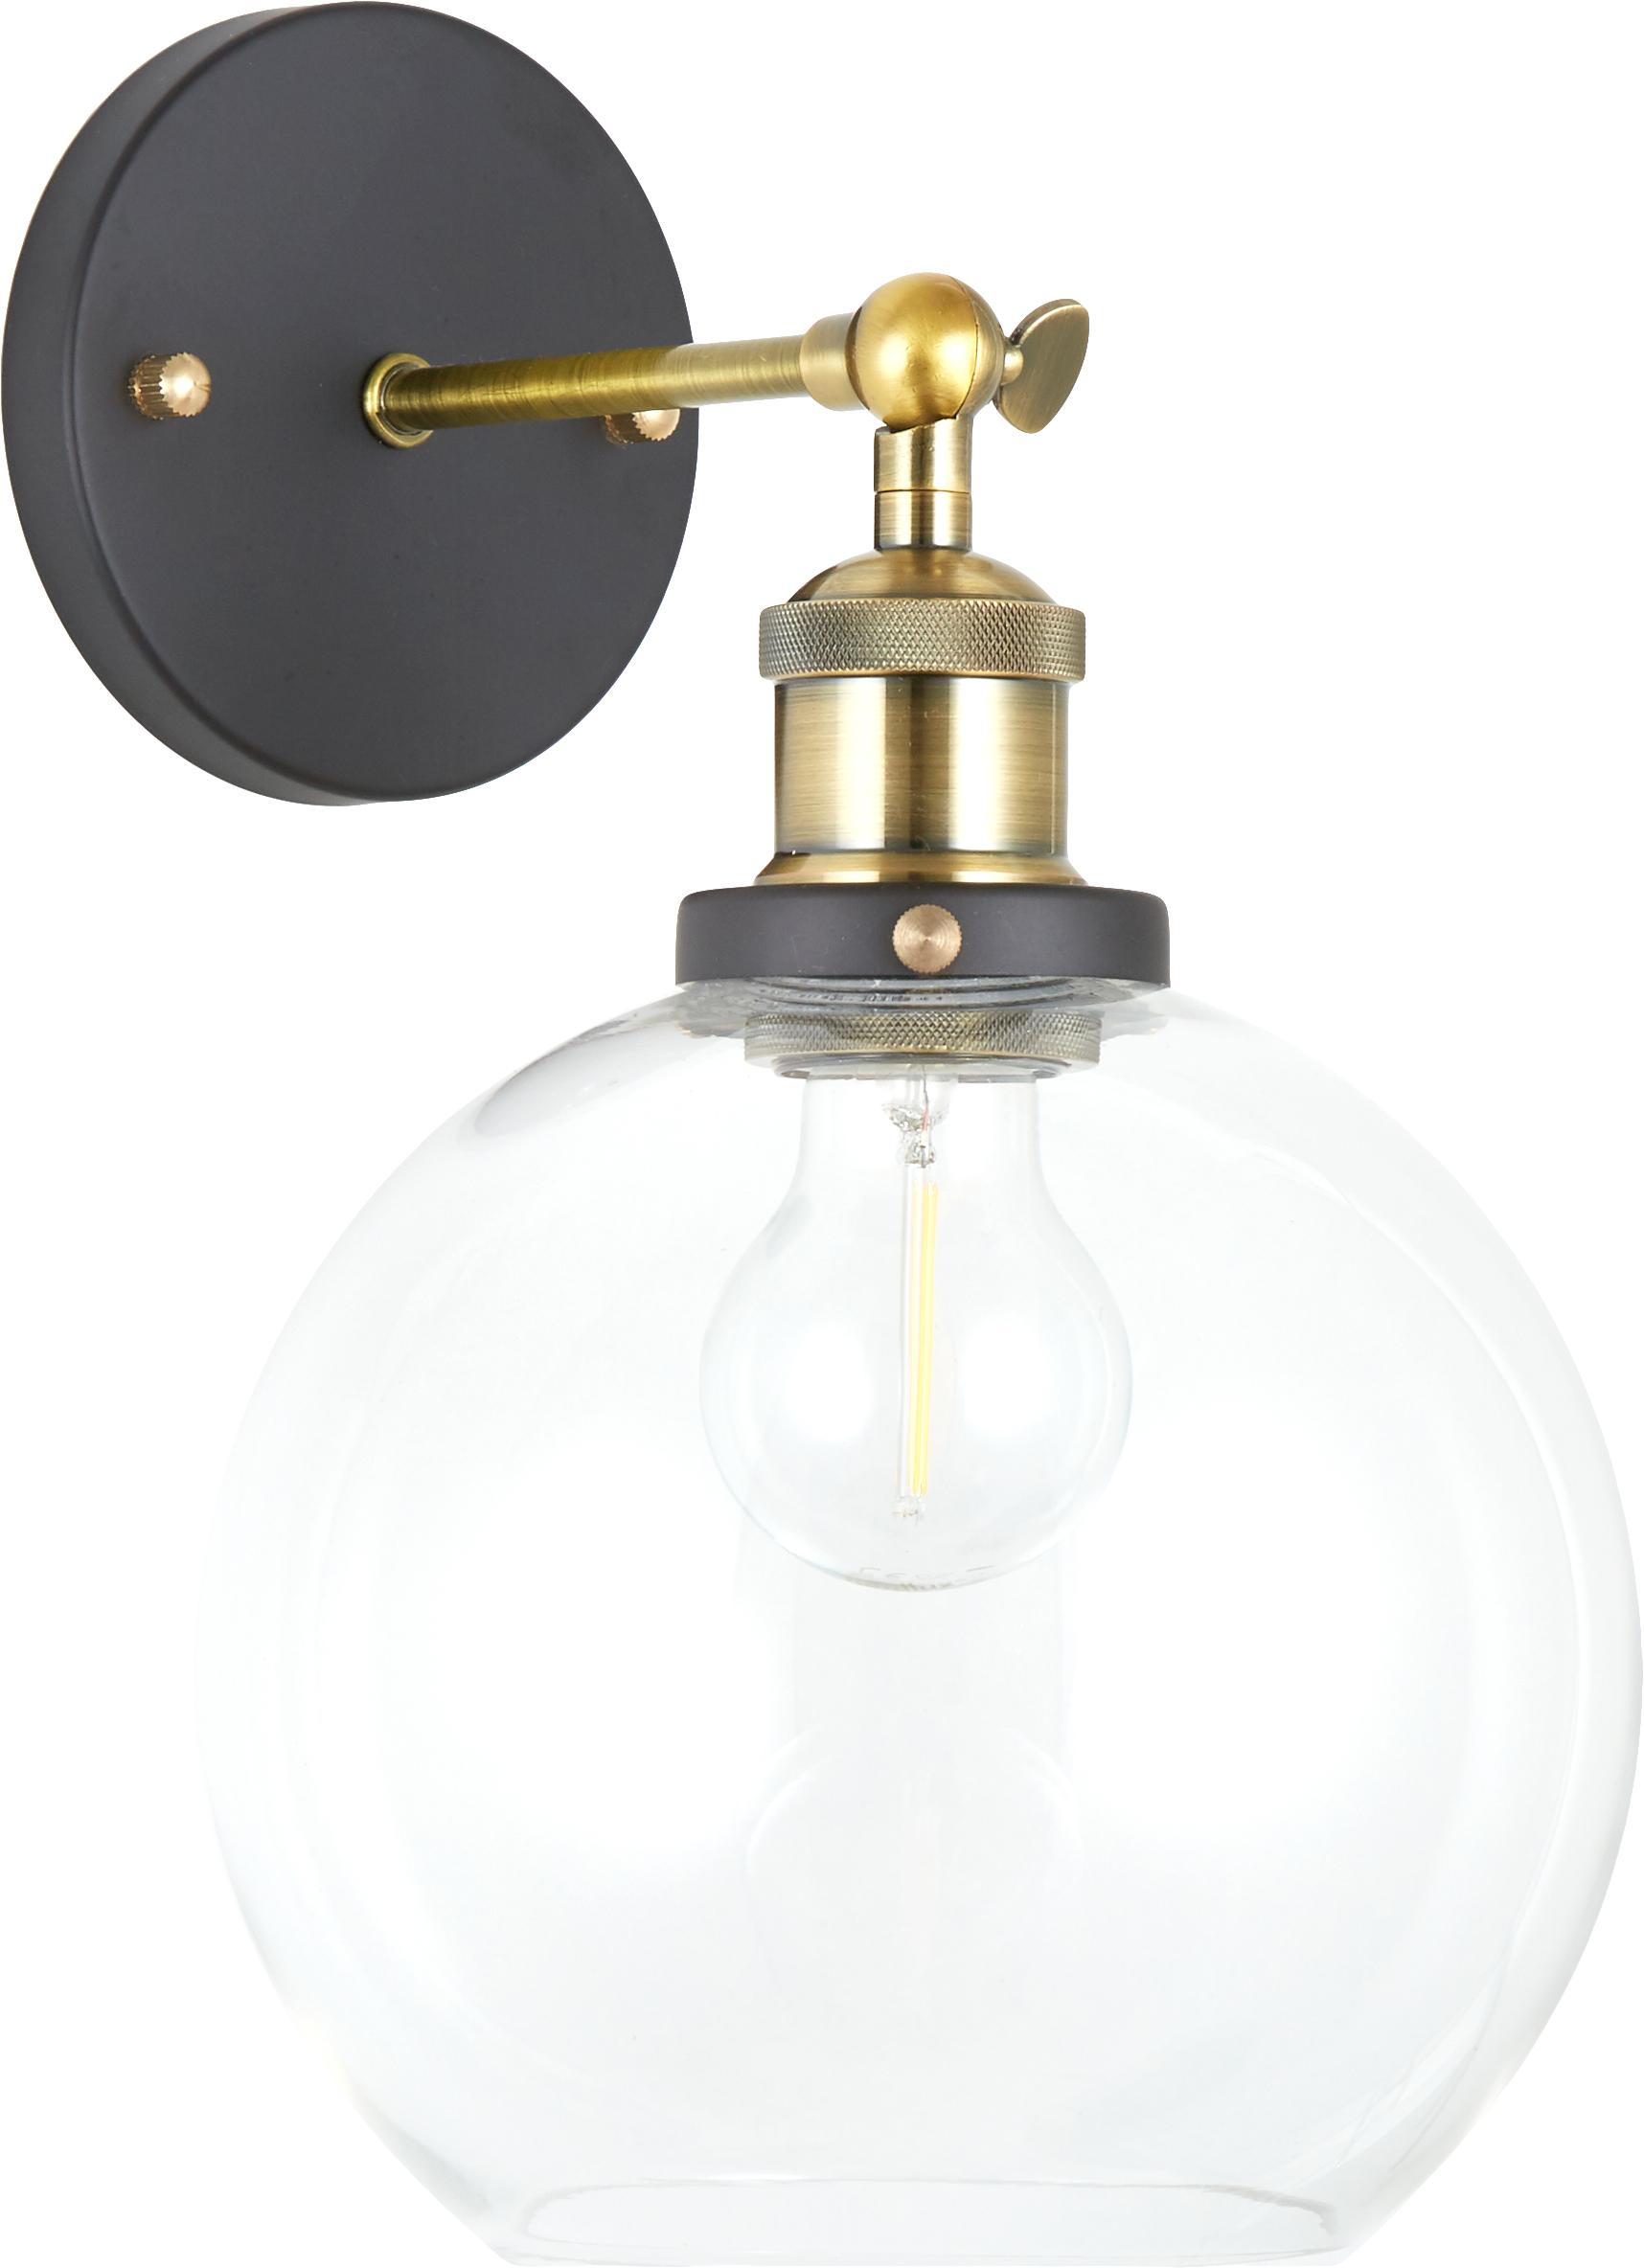 Lampada da parete New York Loft No.2, Baldacchino: metallo verniciato a polv, Paralume: vetro, Nero, ottone trasparente, Larg.  20 x  Alt. 30 cm